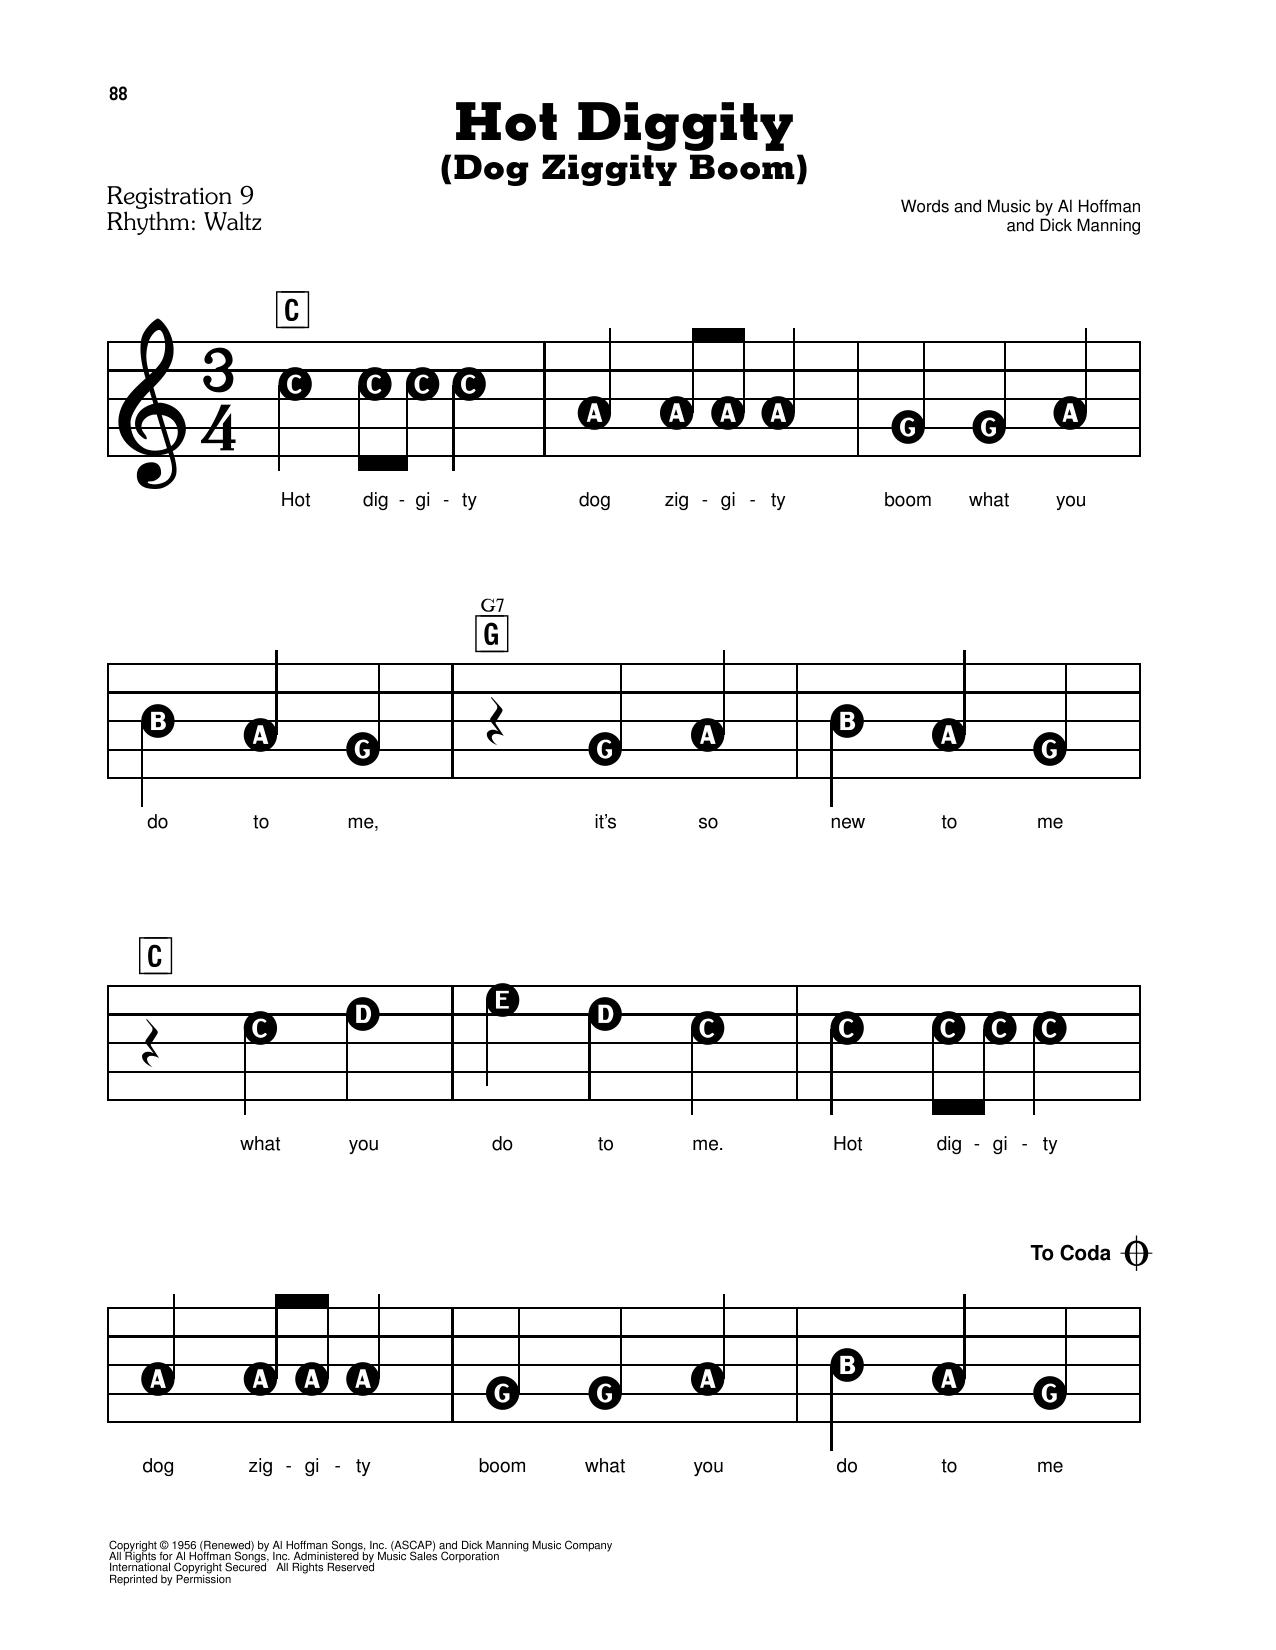 Hot Diggity (Dog Ziggity Boom) Sheet Music